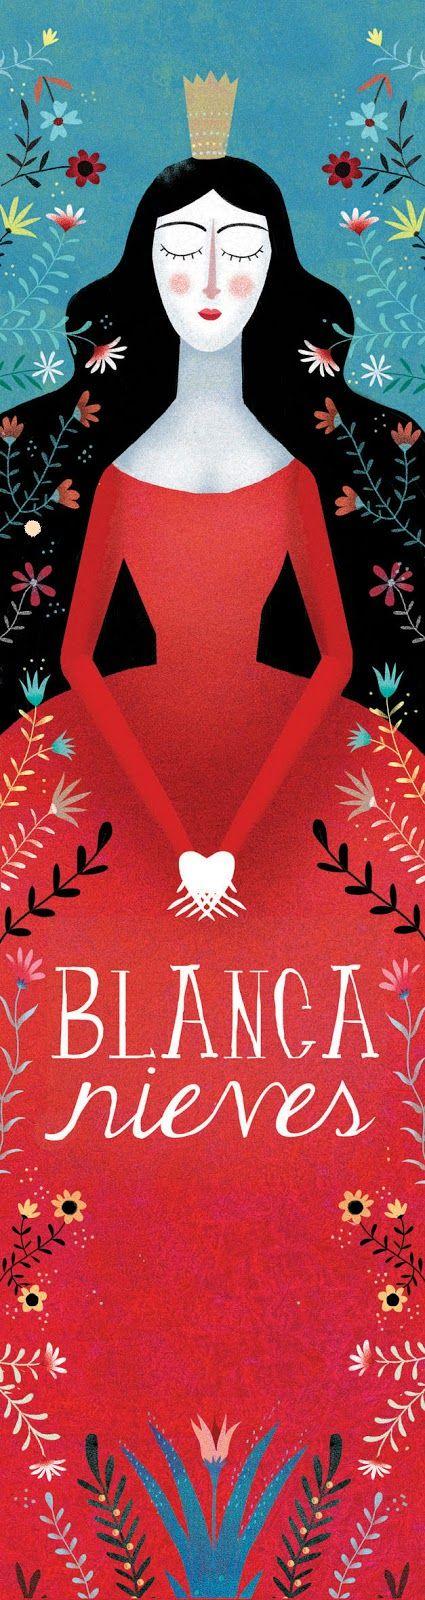 Mariana Ruiz Johnson Illustrations: Snow White, Unaluna Publisher, Buenos Aires, 2014